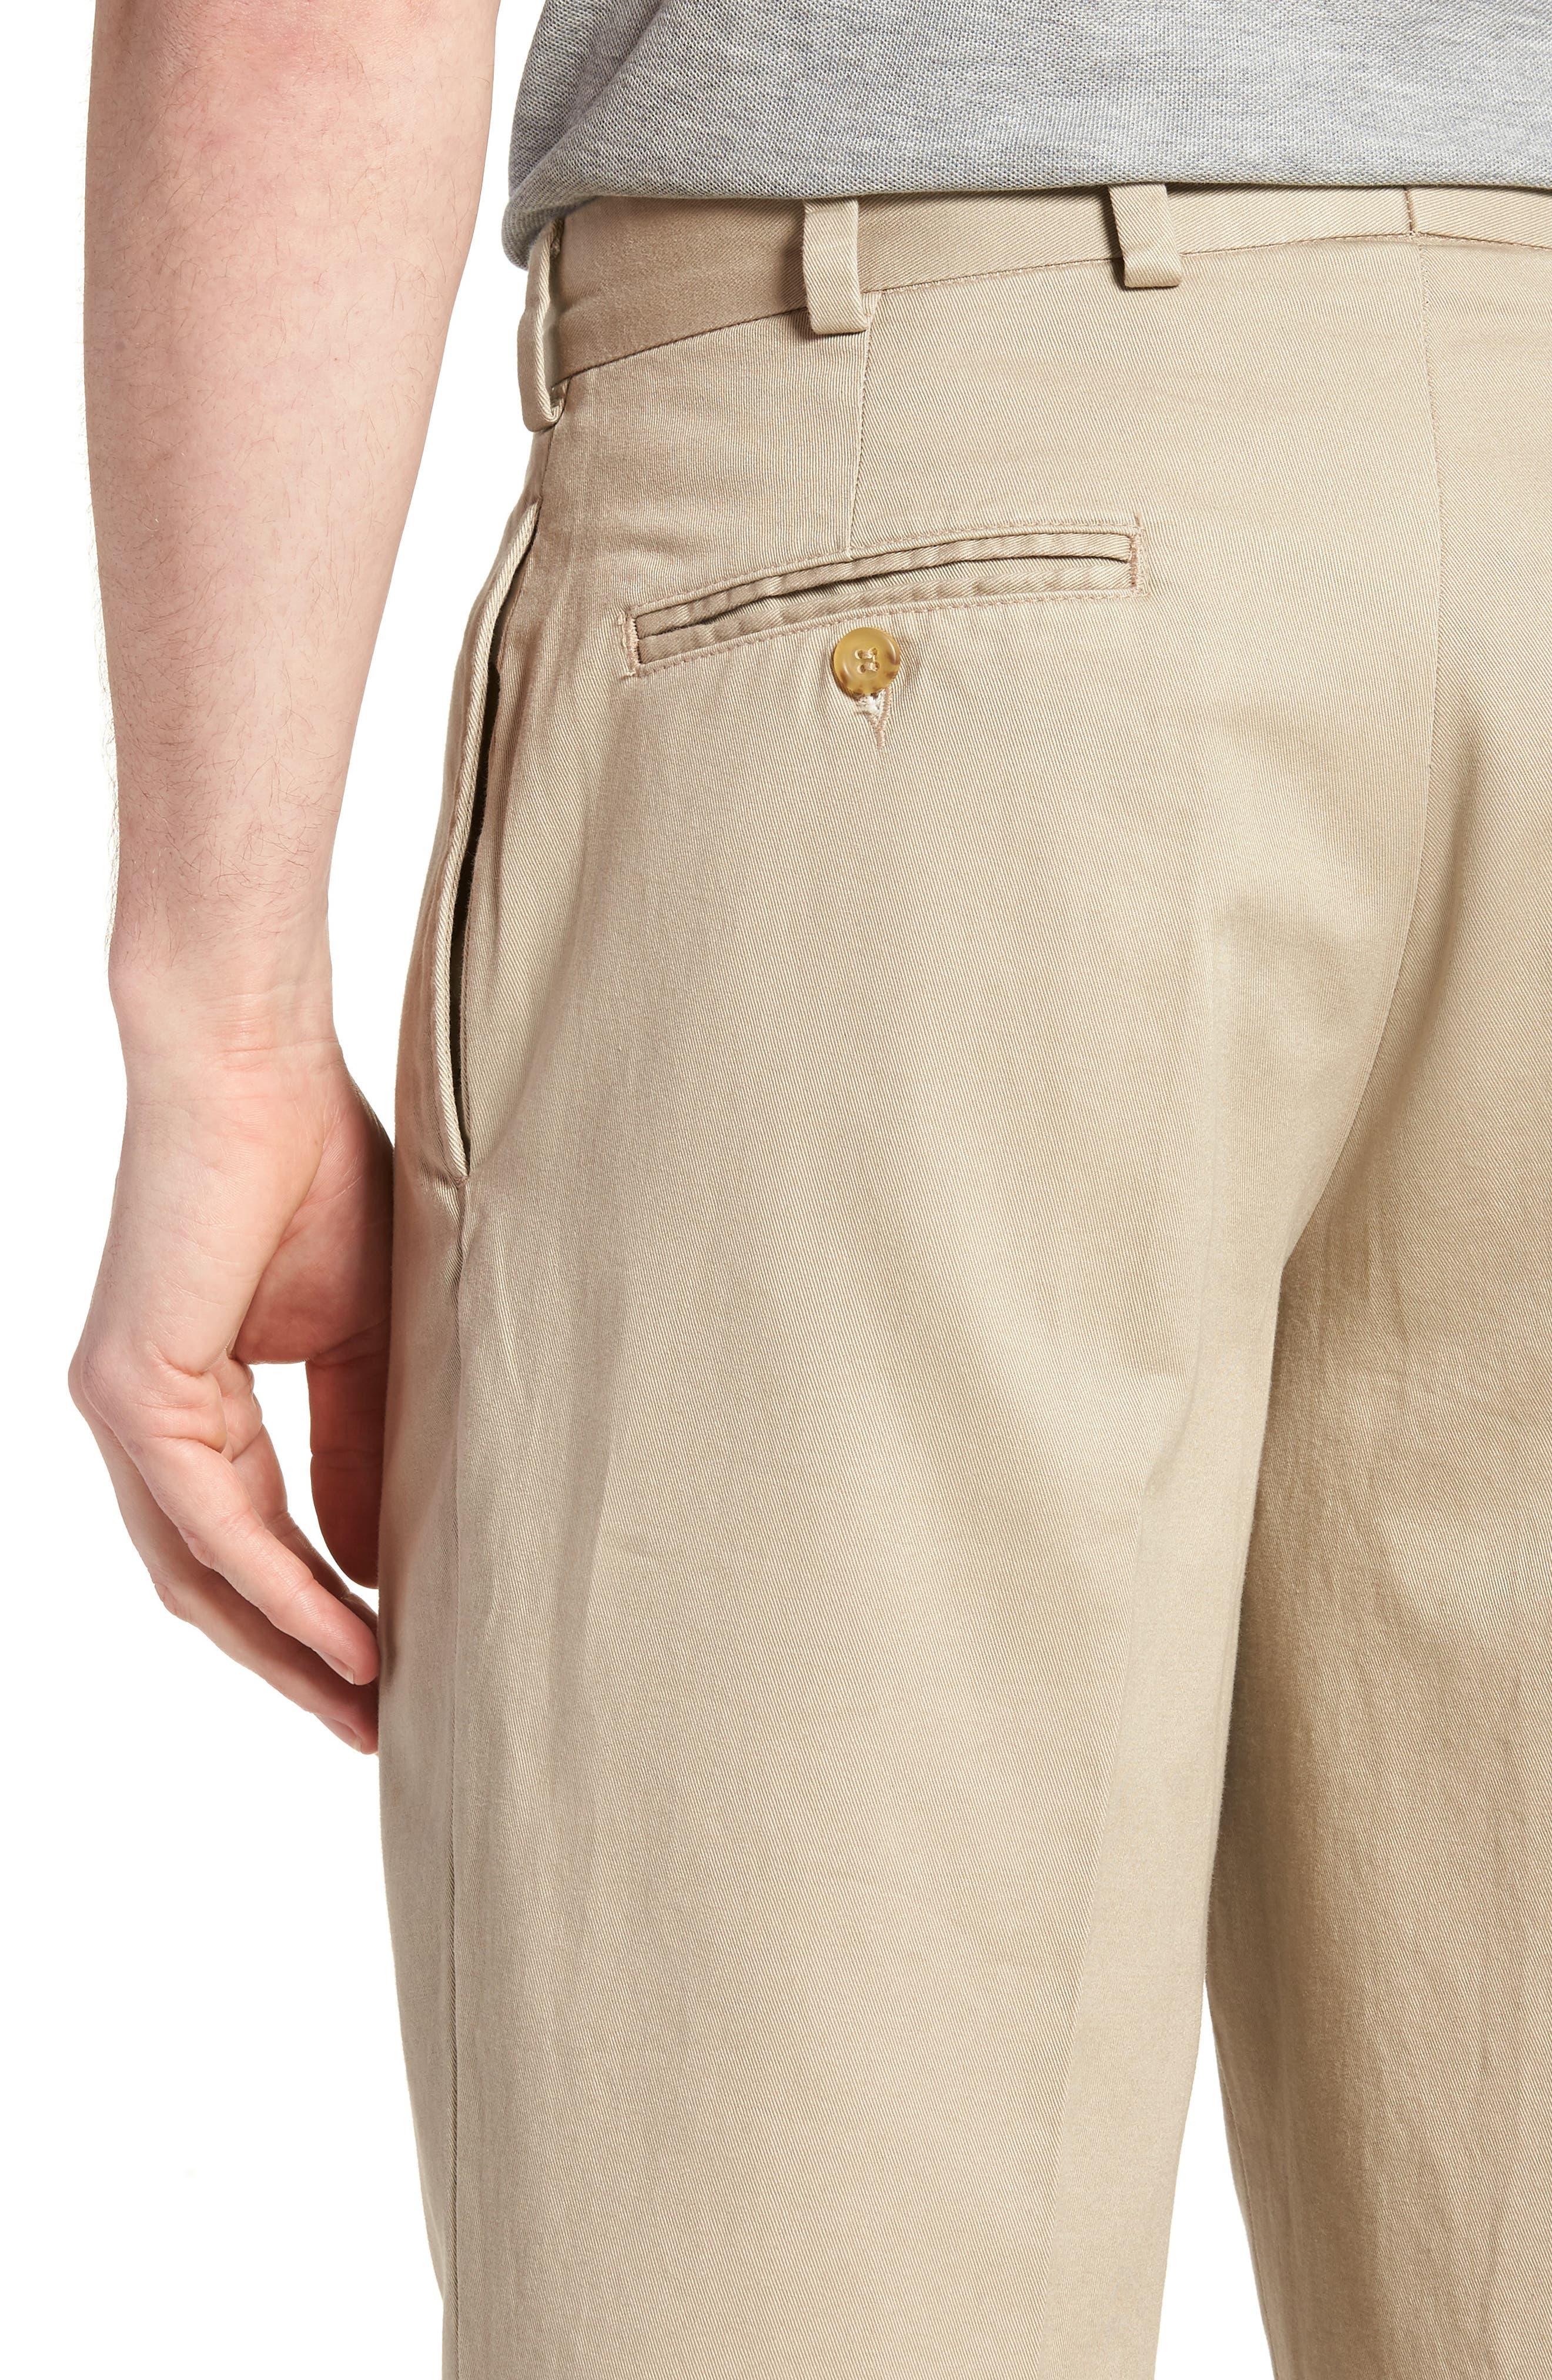 M2 Classic Fit Pleated Vintage Twill Pants,                             Alternate thumbnail 4, color,                             Khaki